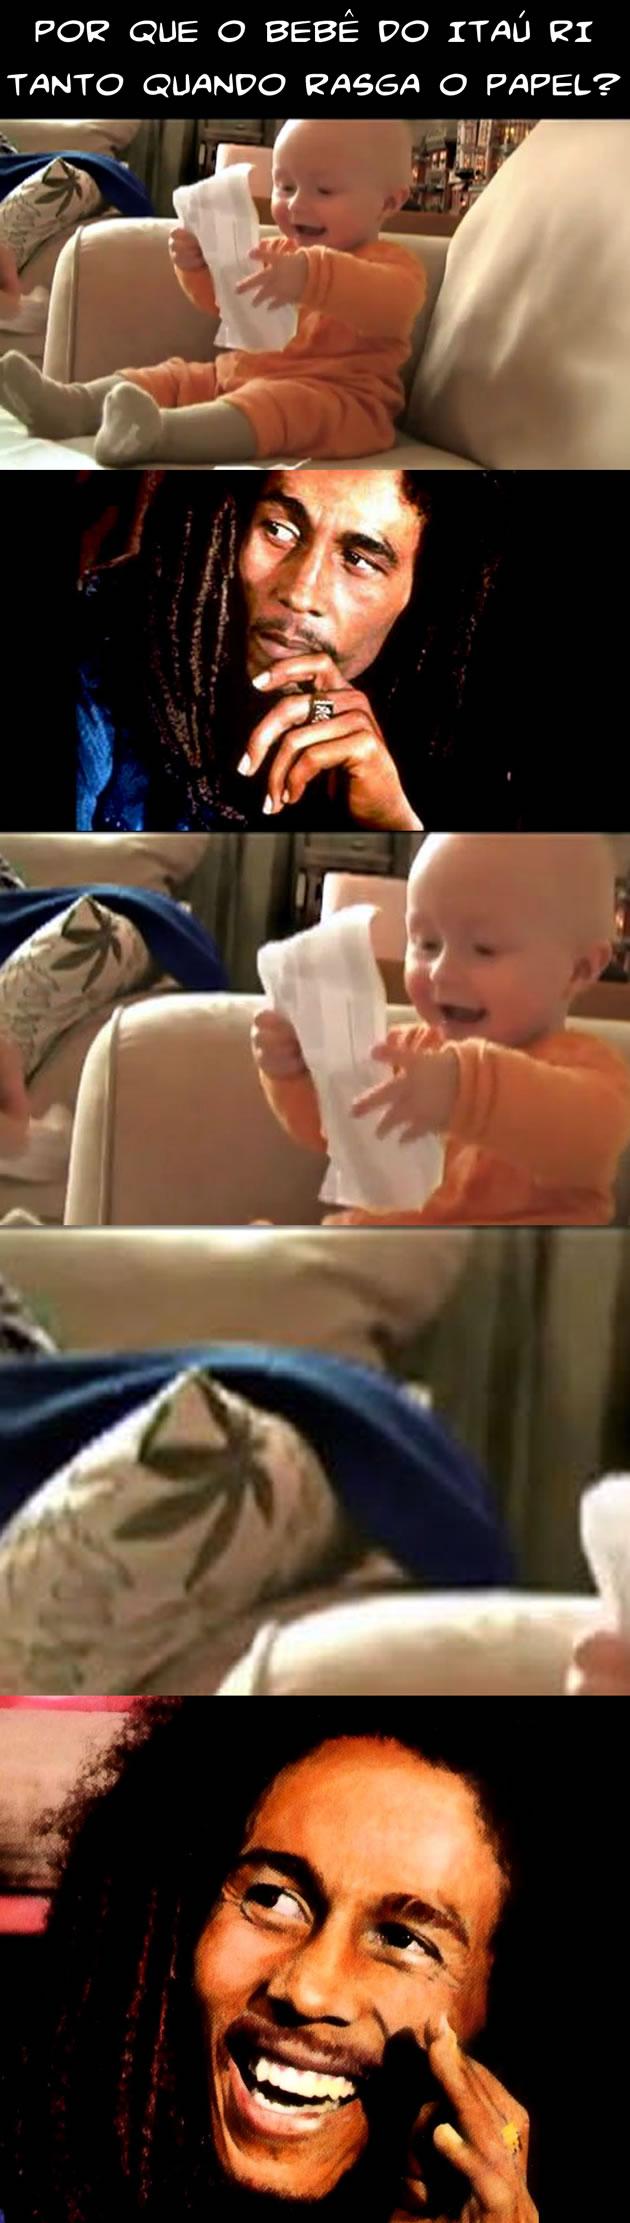 bebe itau O Bebê do Itaú